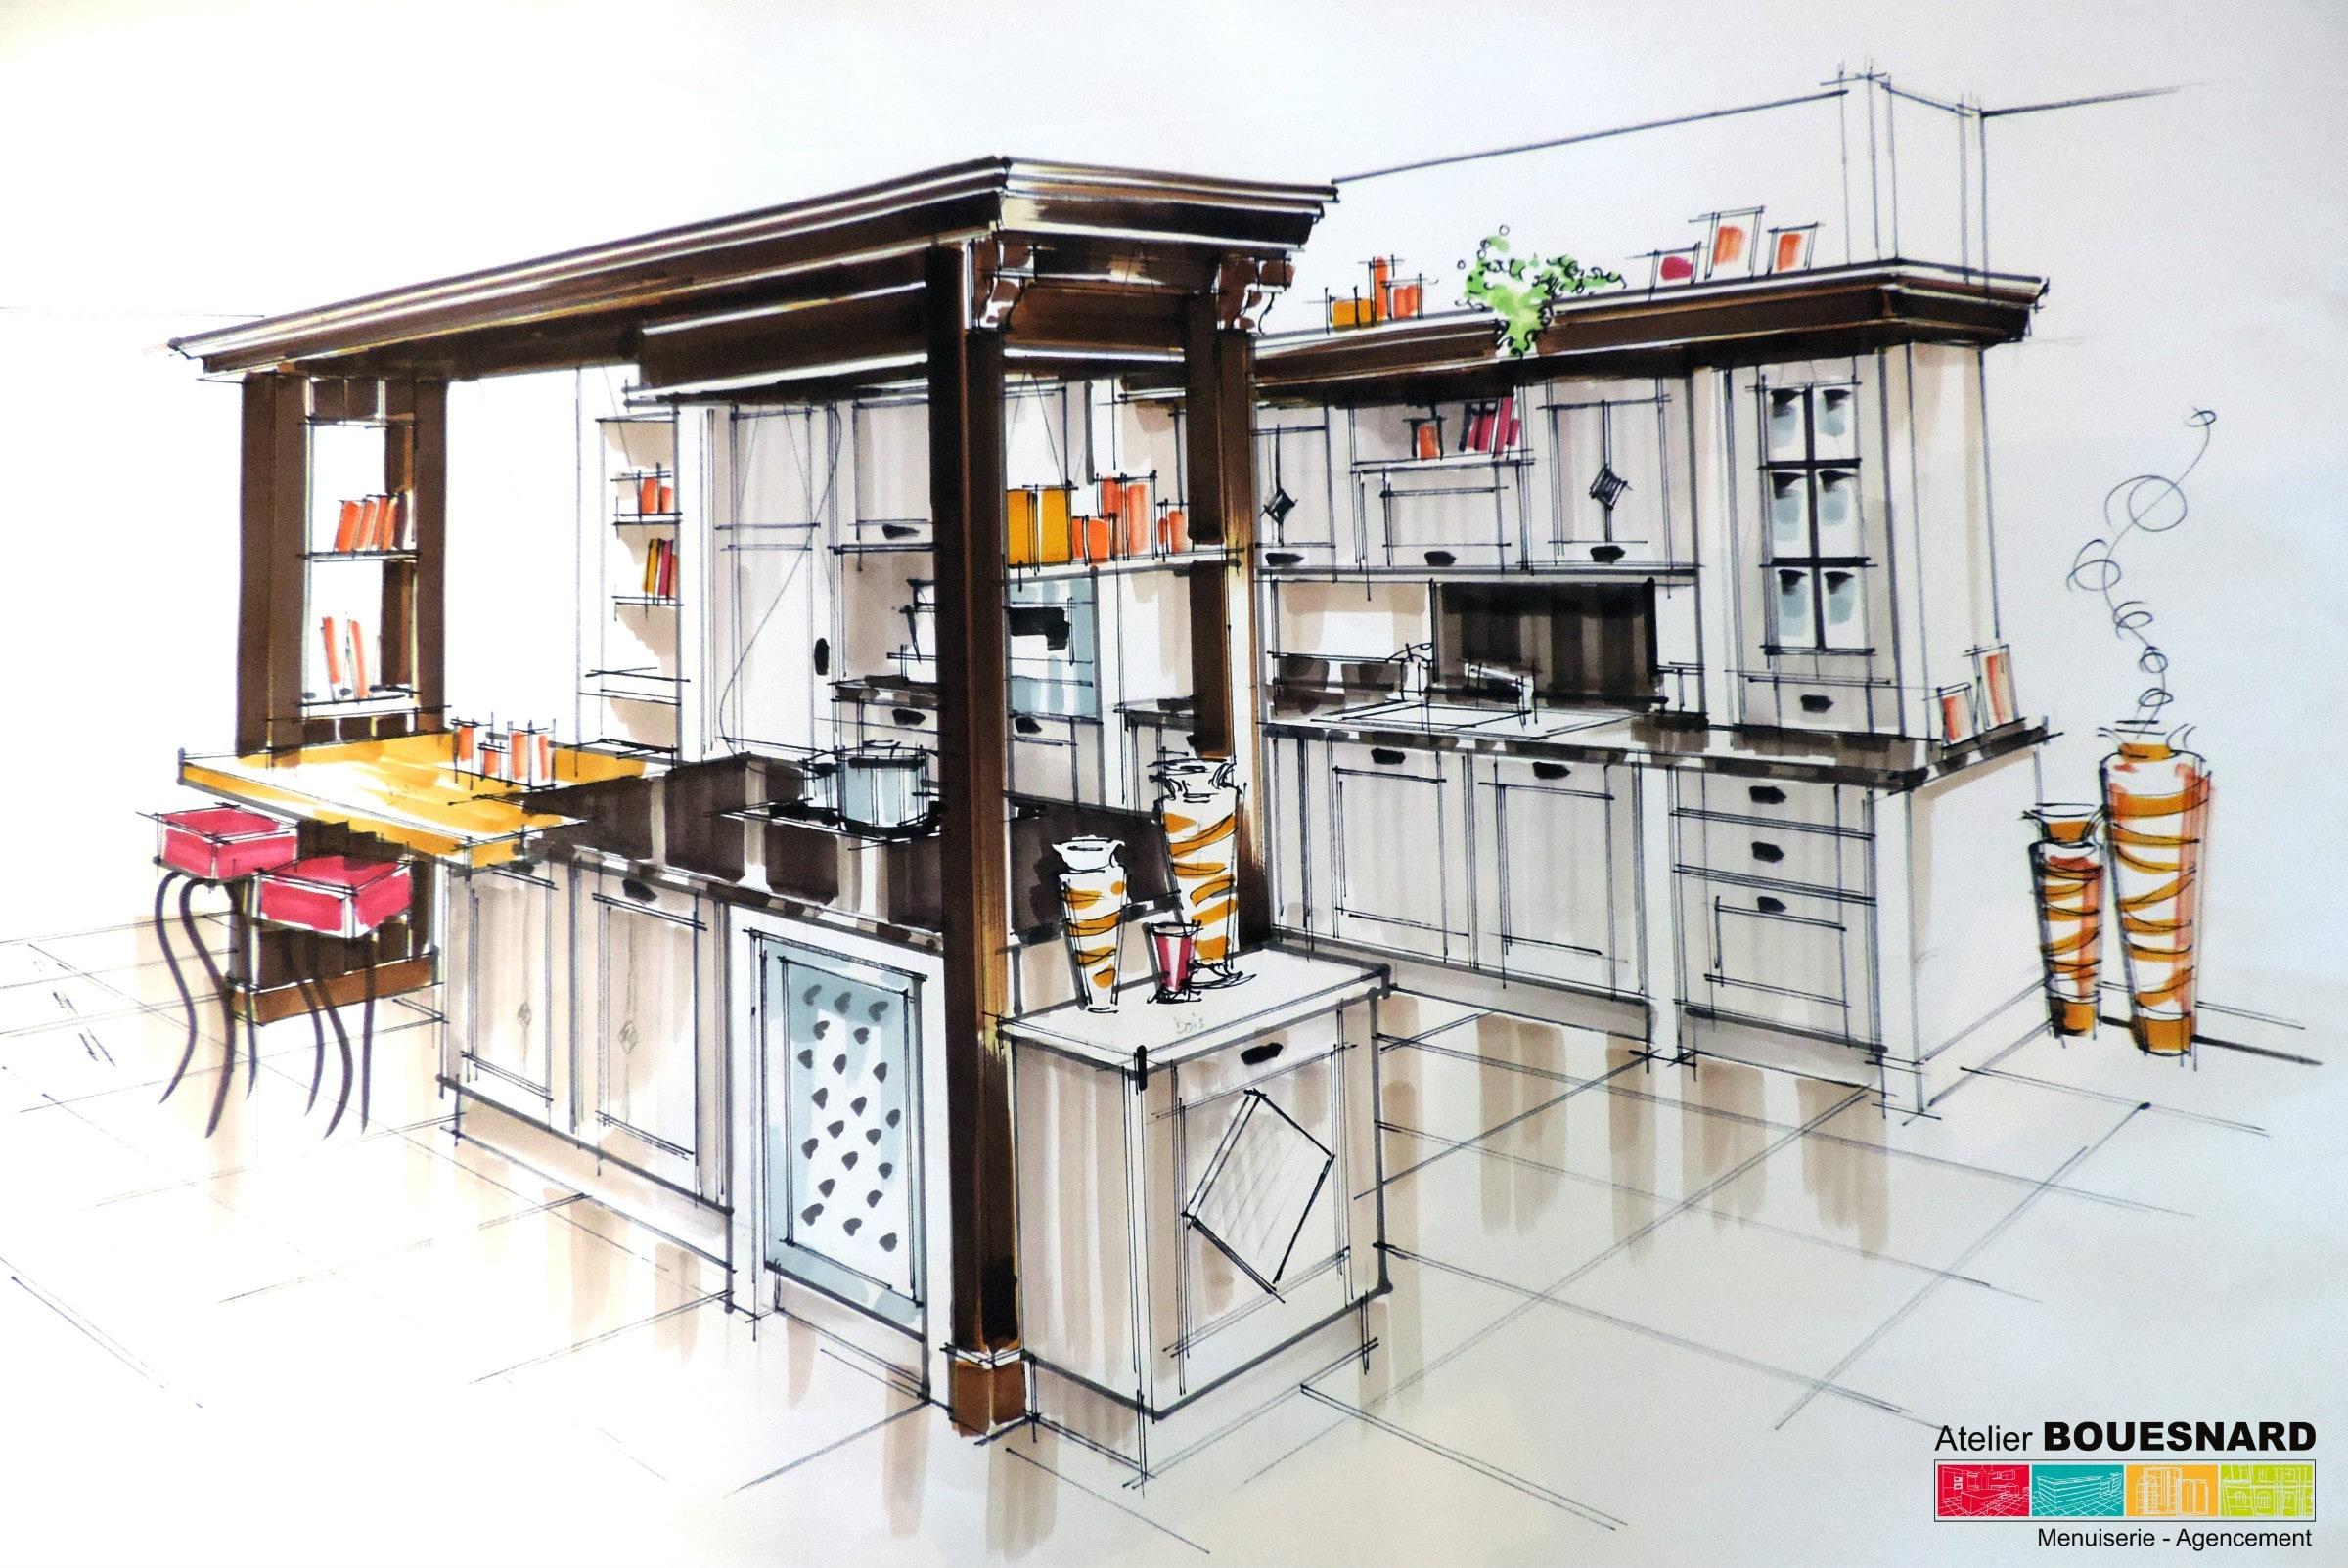 Atelier bouesnard menuisier agencement dressing for Agencement cuisine france